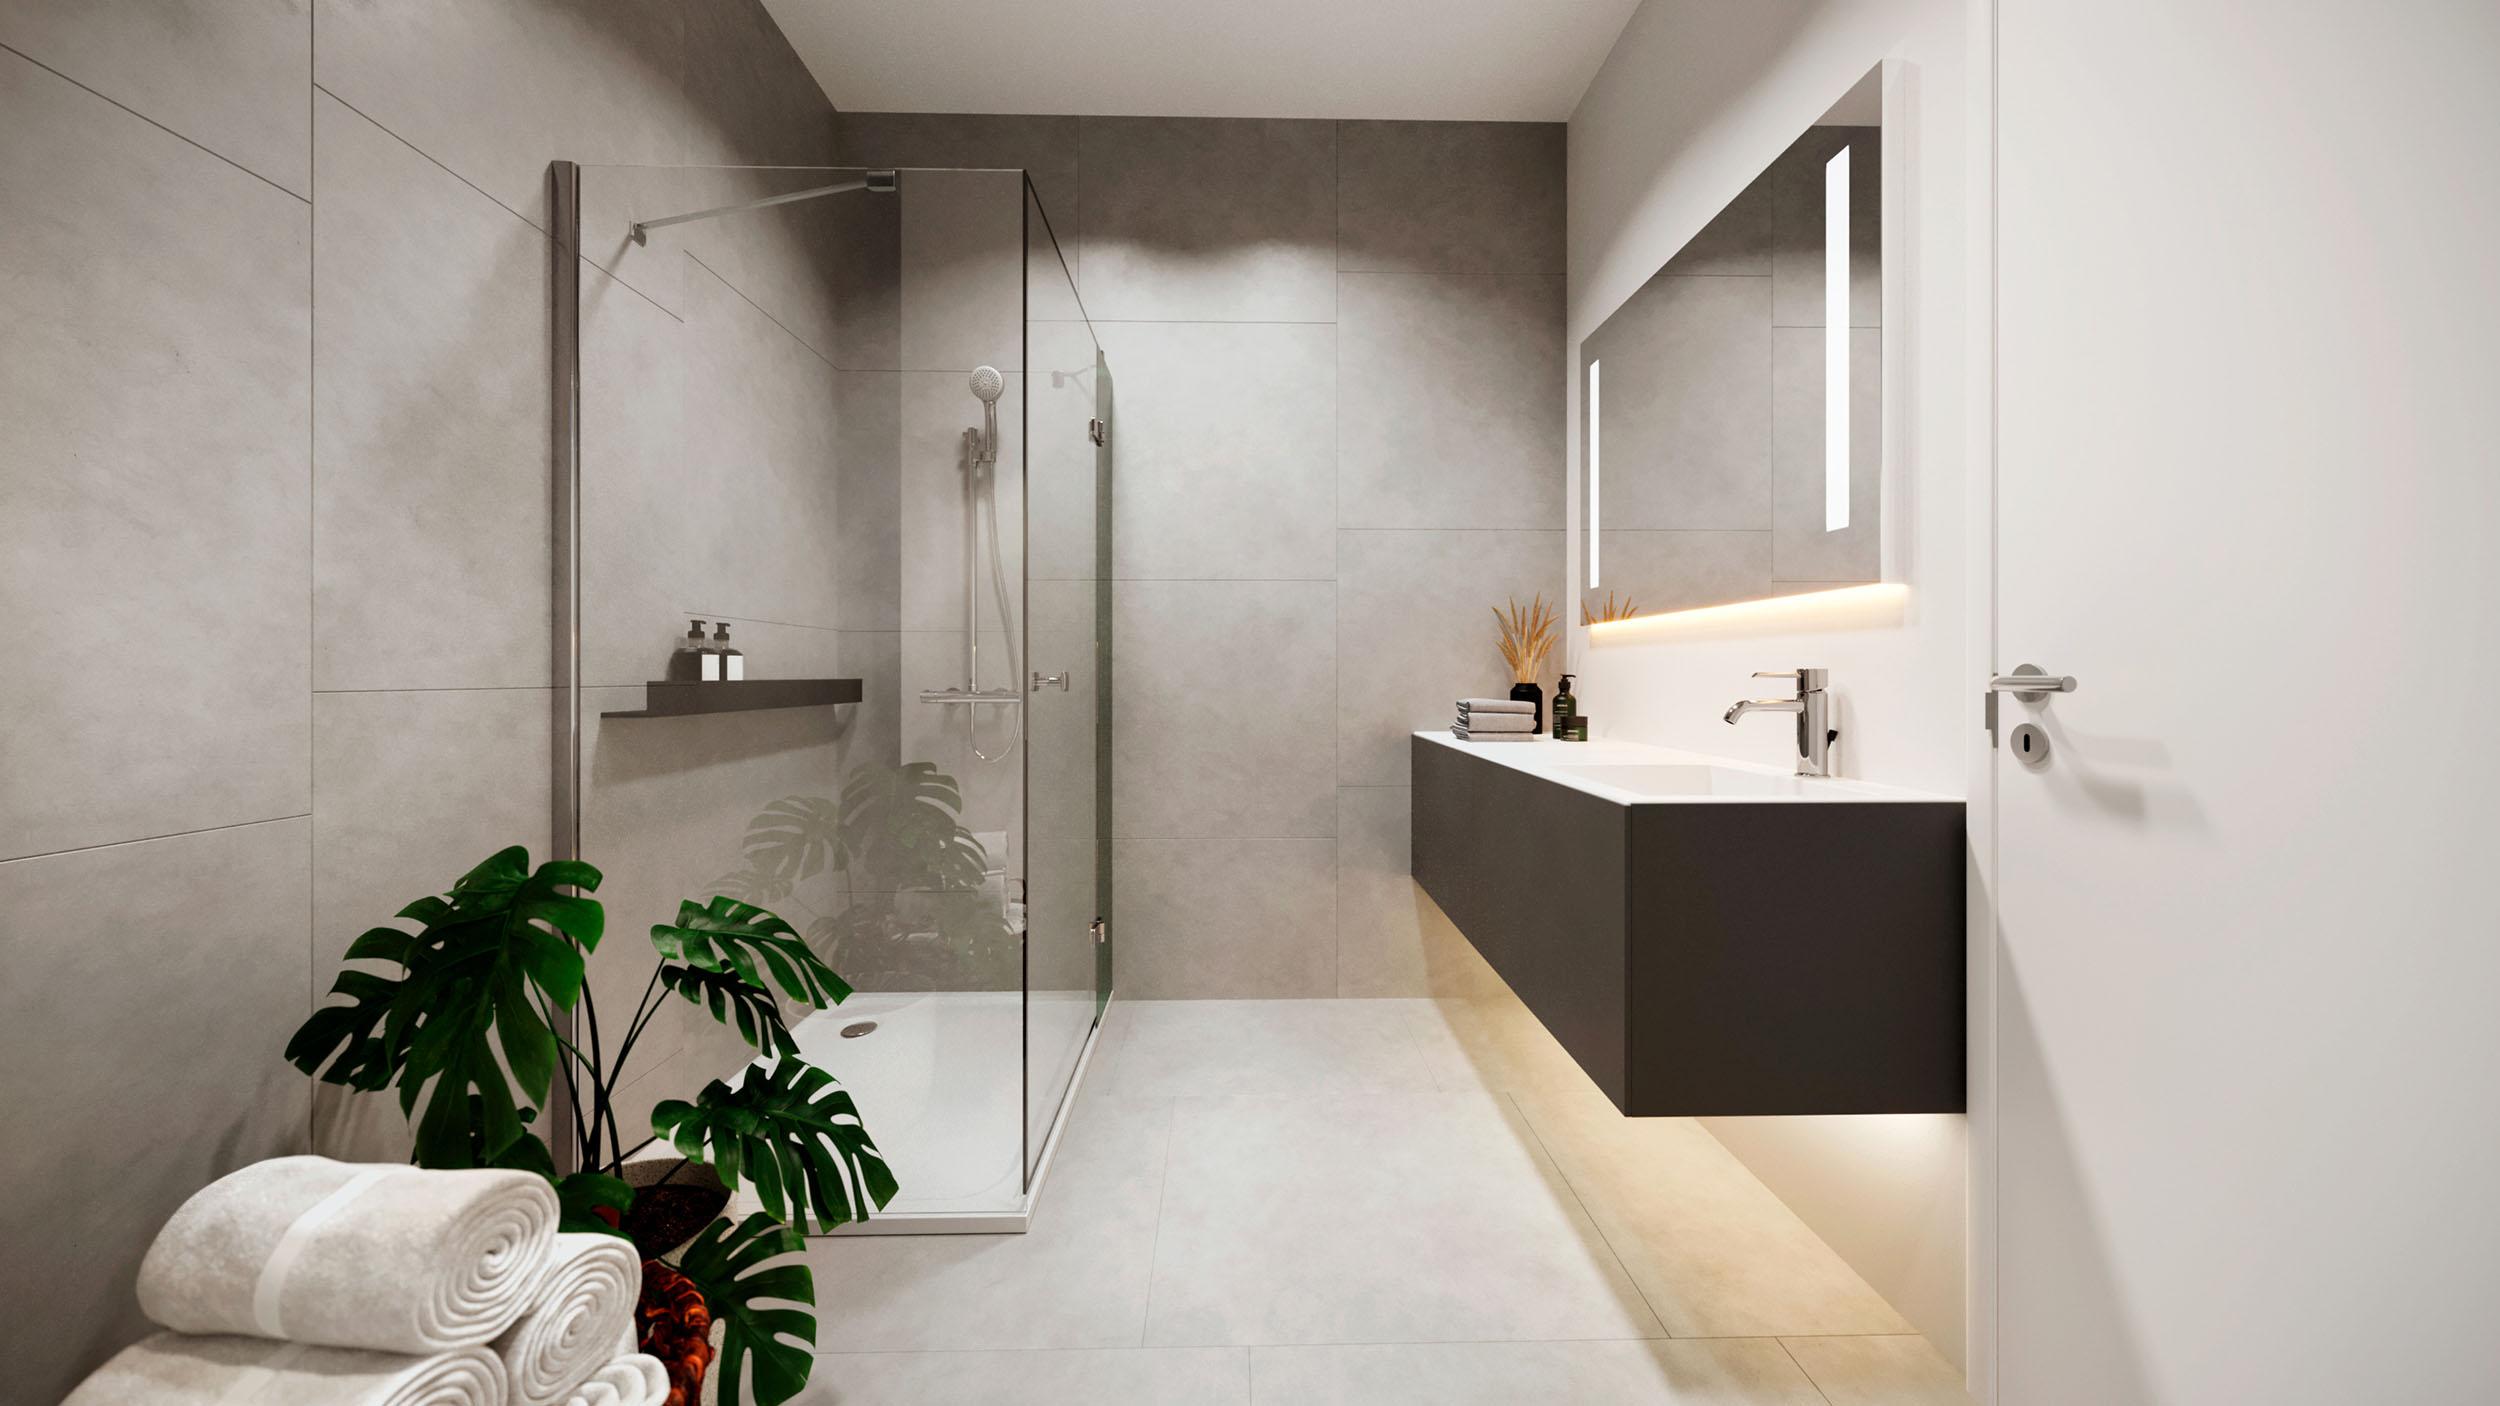 Zoetwaterlande badkamer